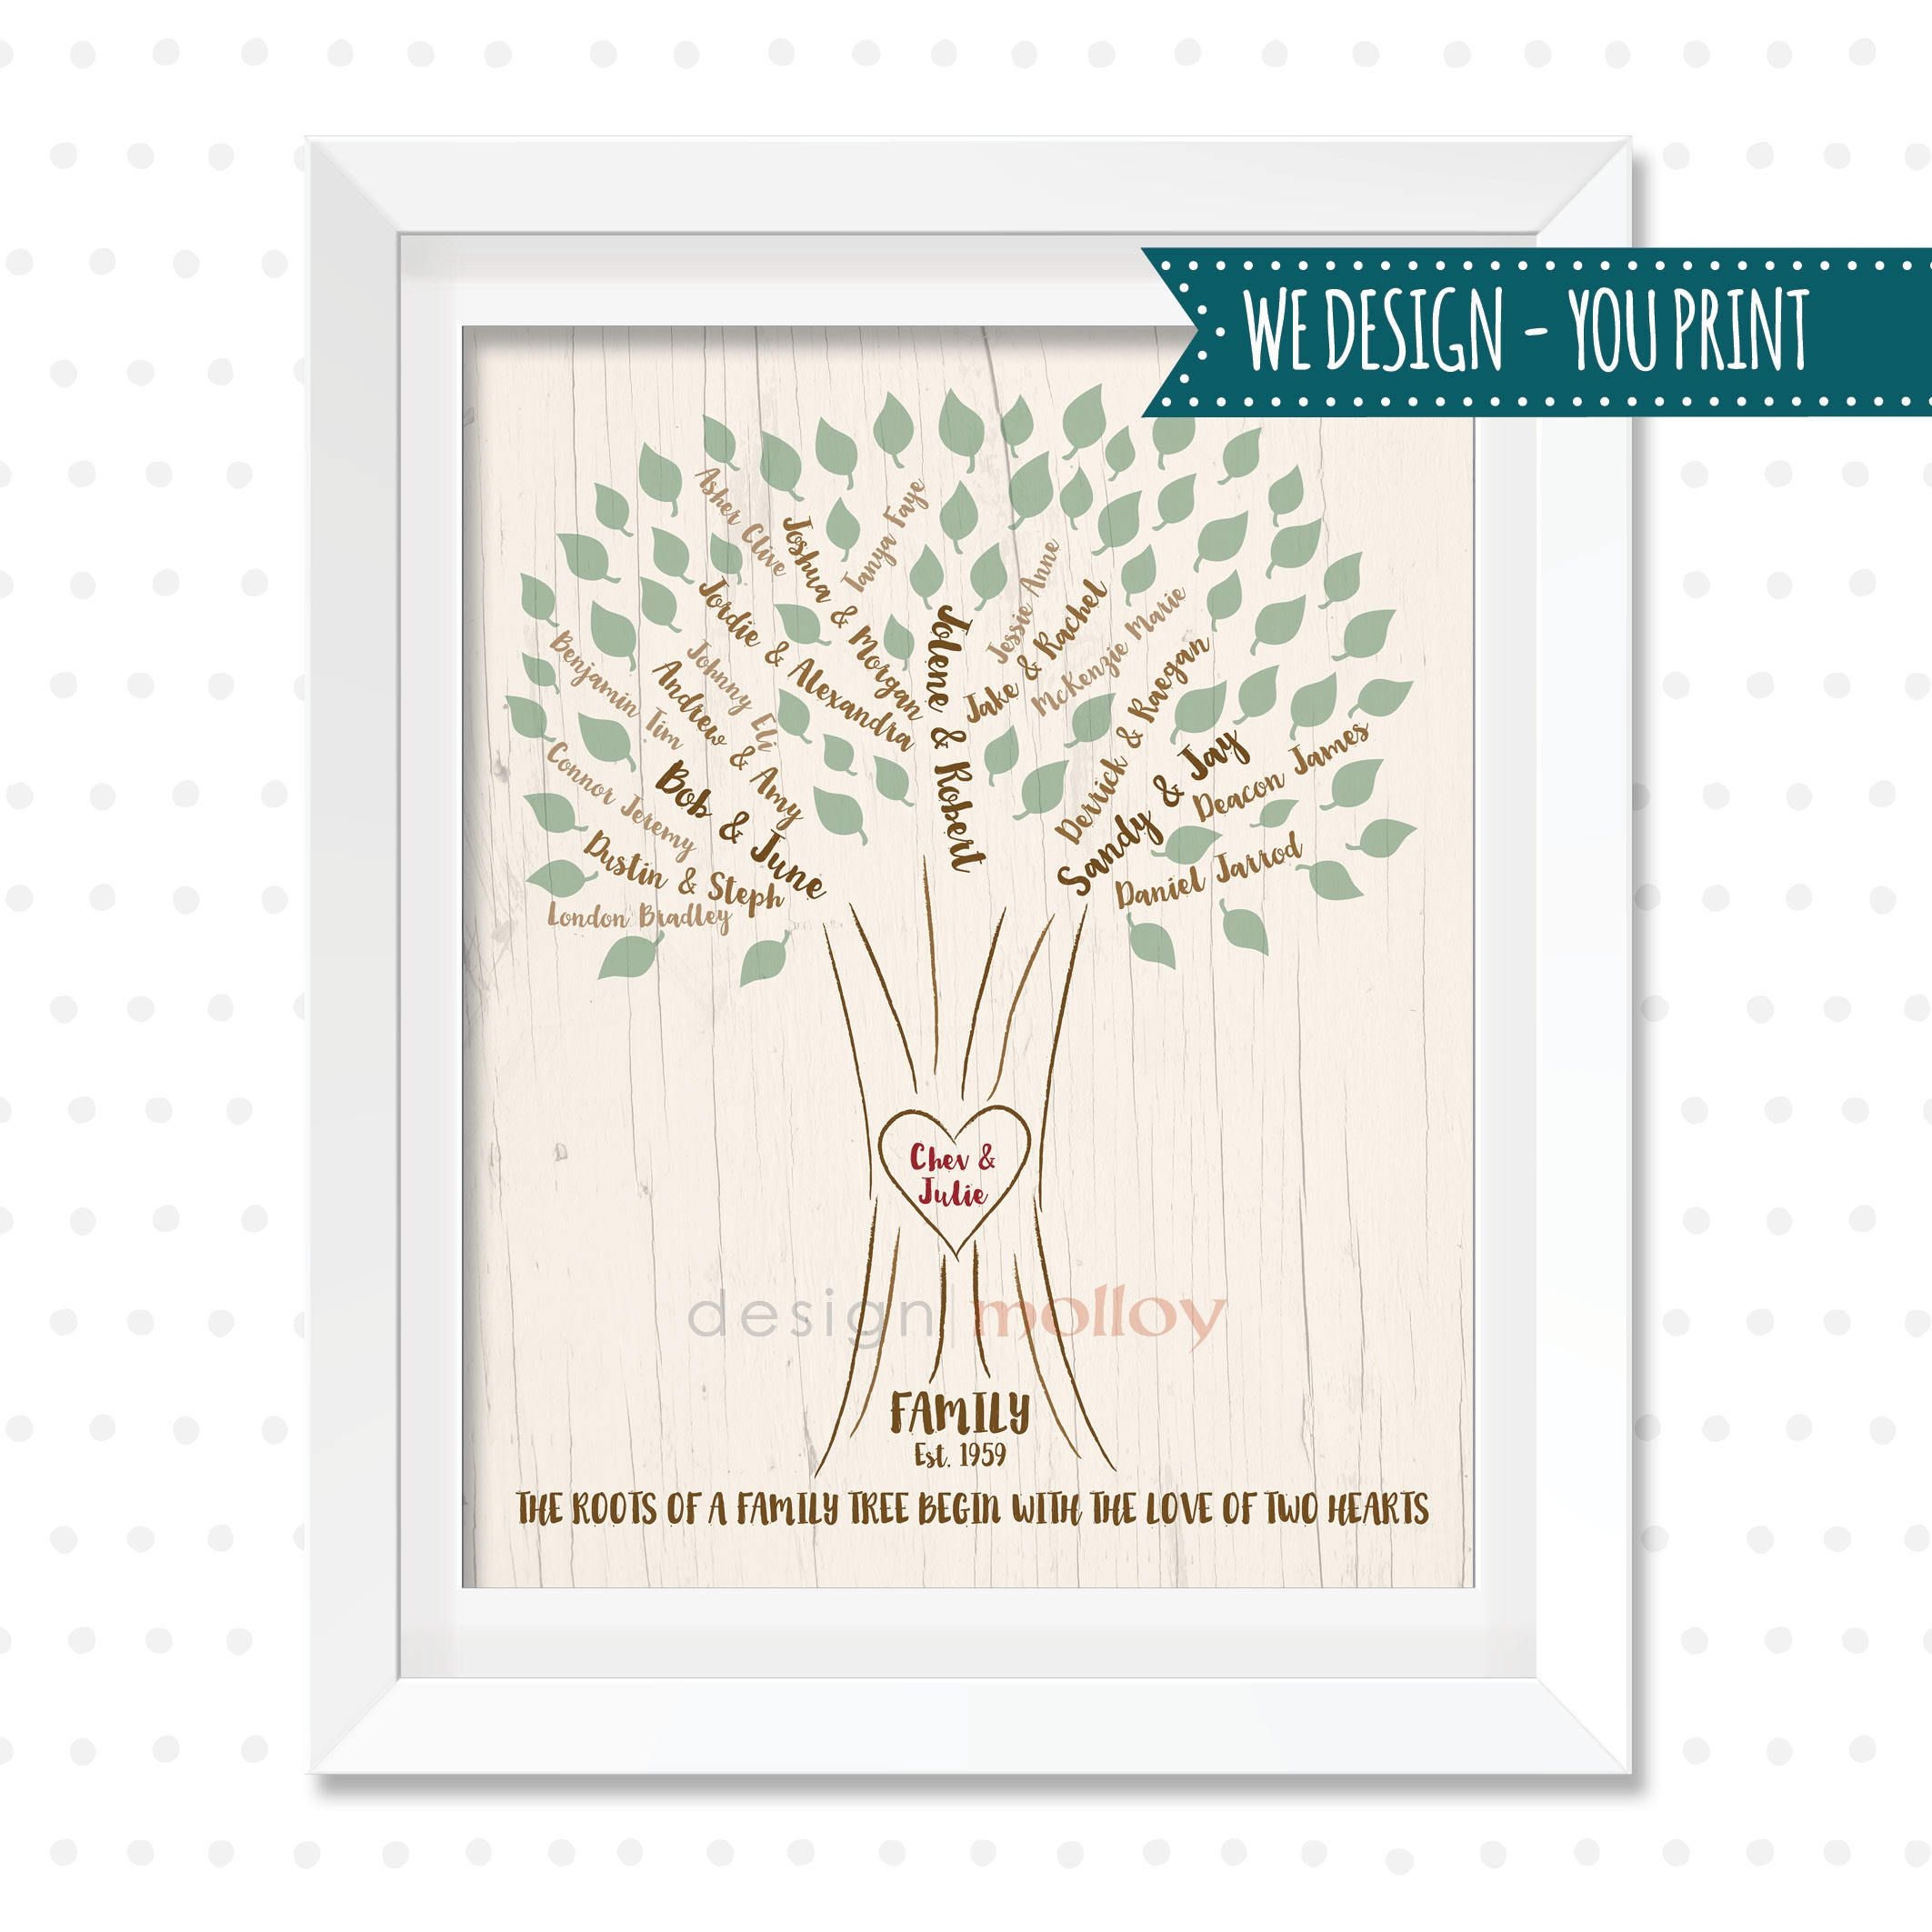 Digital Family Tree - Printable Family Tree, Gift for Grandparents, Custom Family Tree Wall Art, Anniversary Gift, Mother's Day, Christmas #bestgiftsforgrandparents